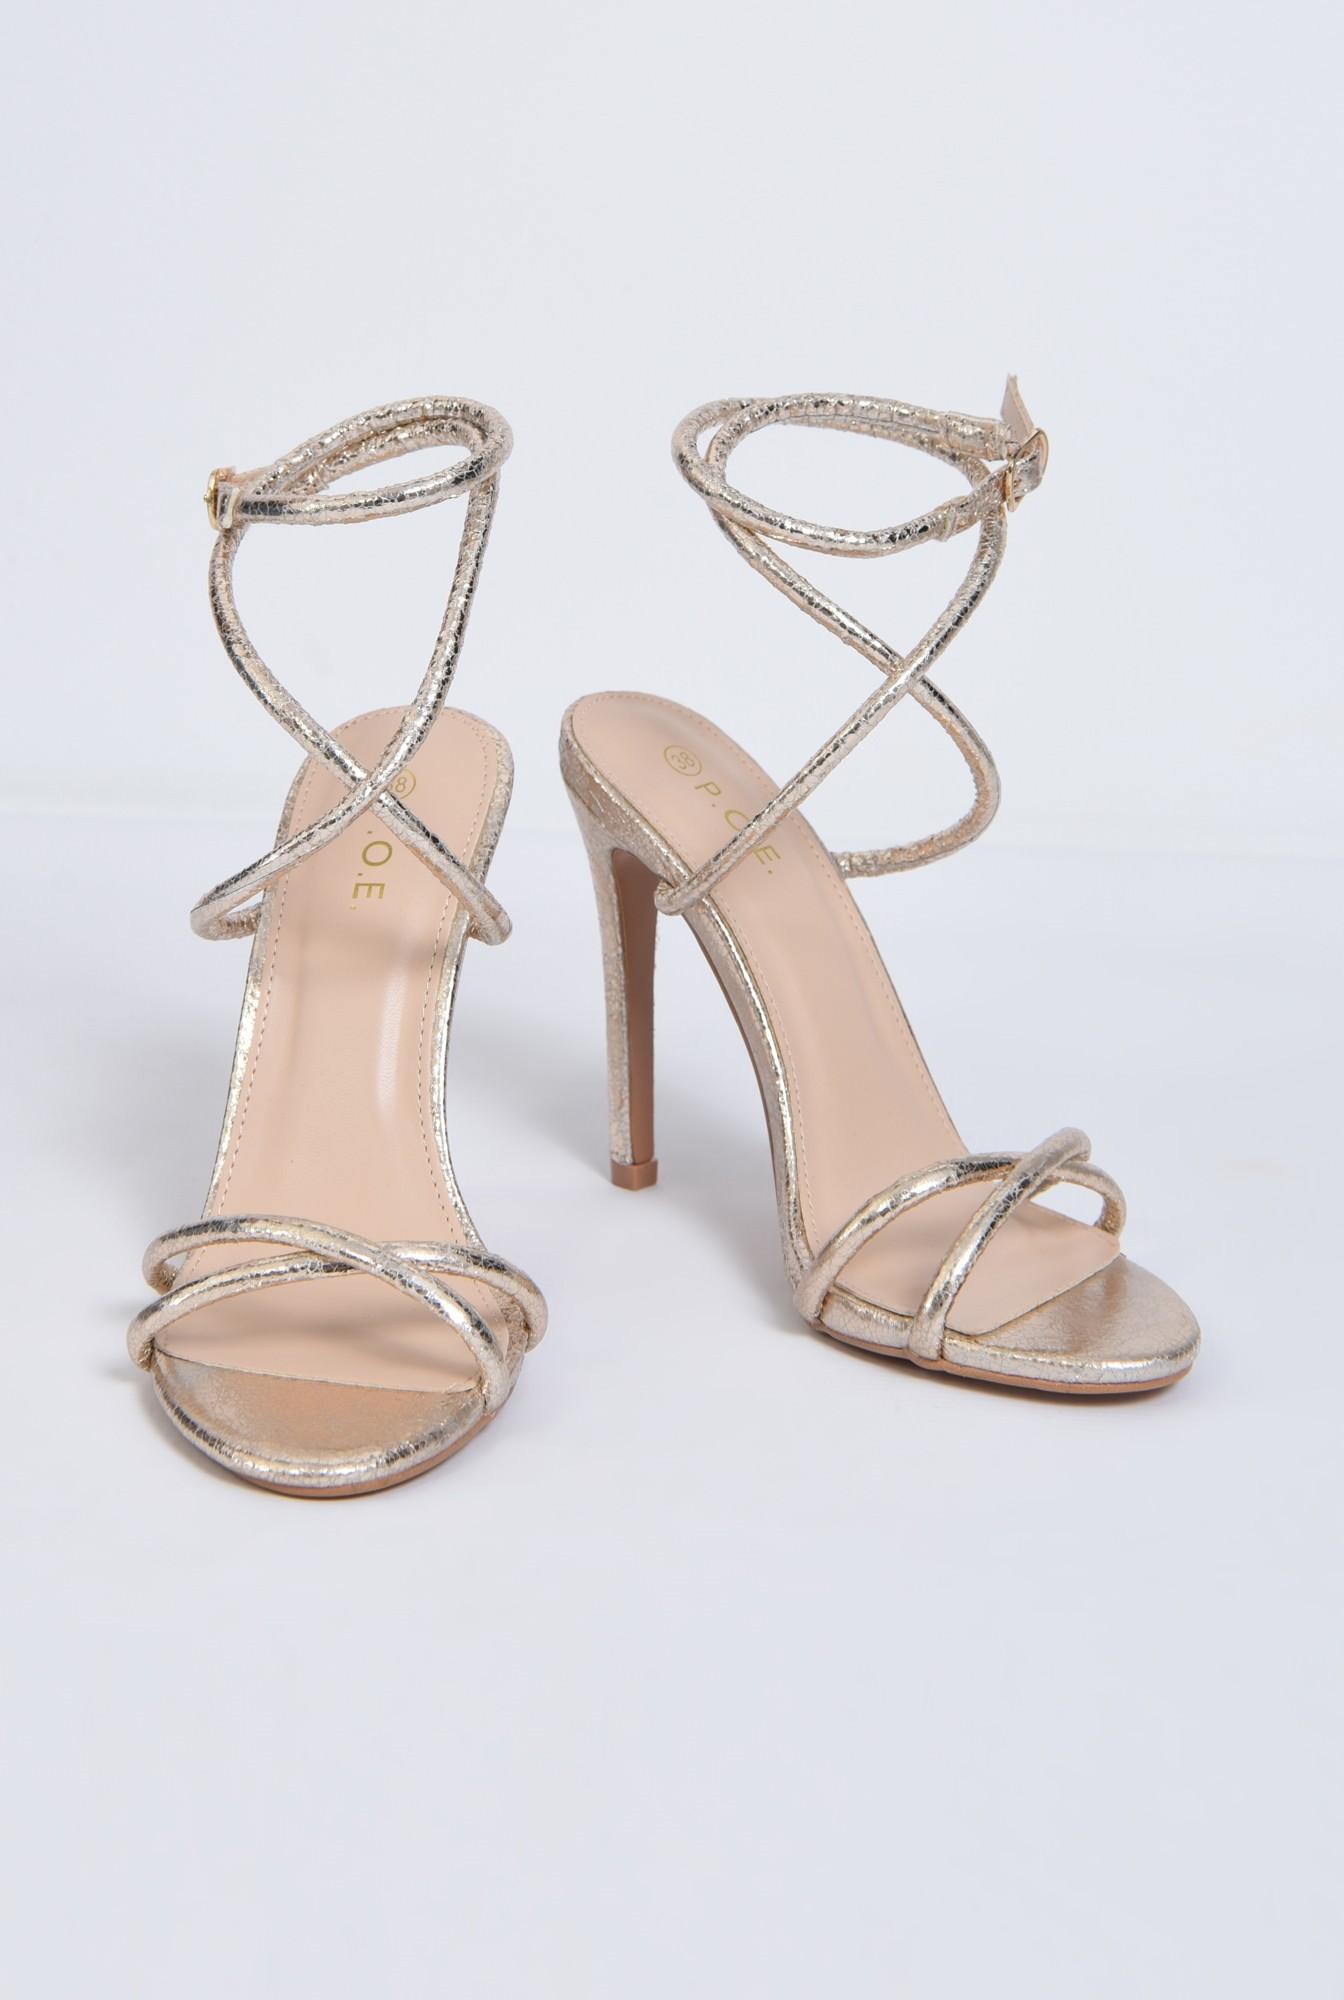 3 - sandale de ocazie, barete subtiri, toc inalt